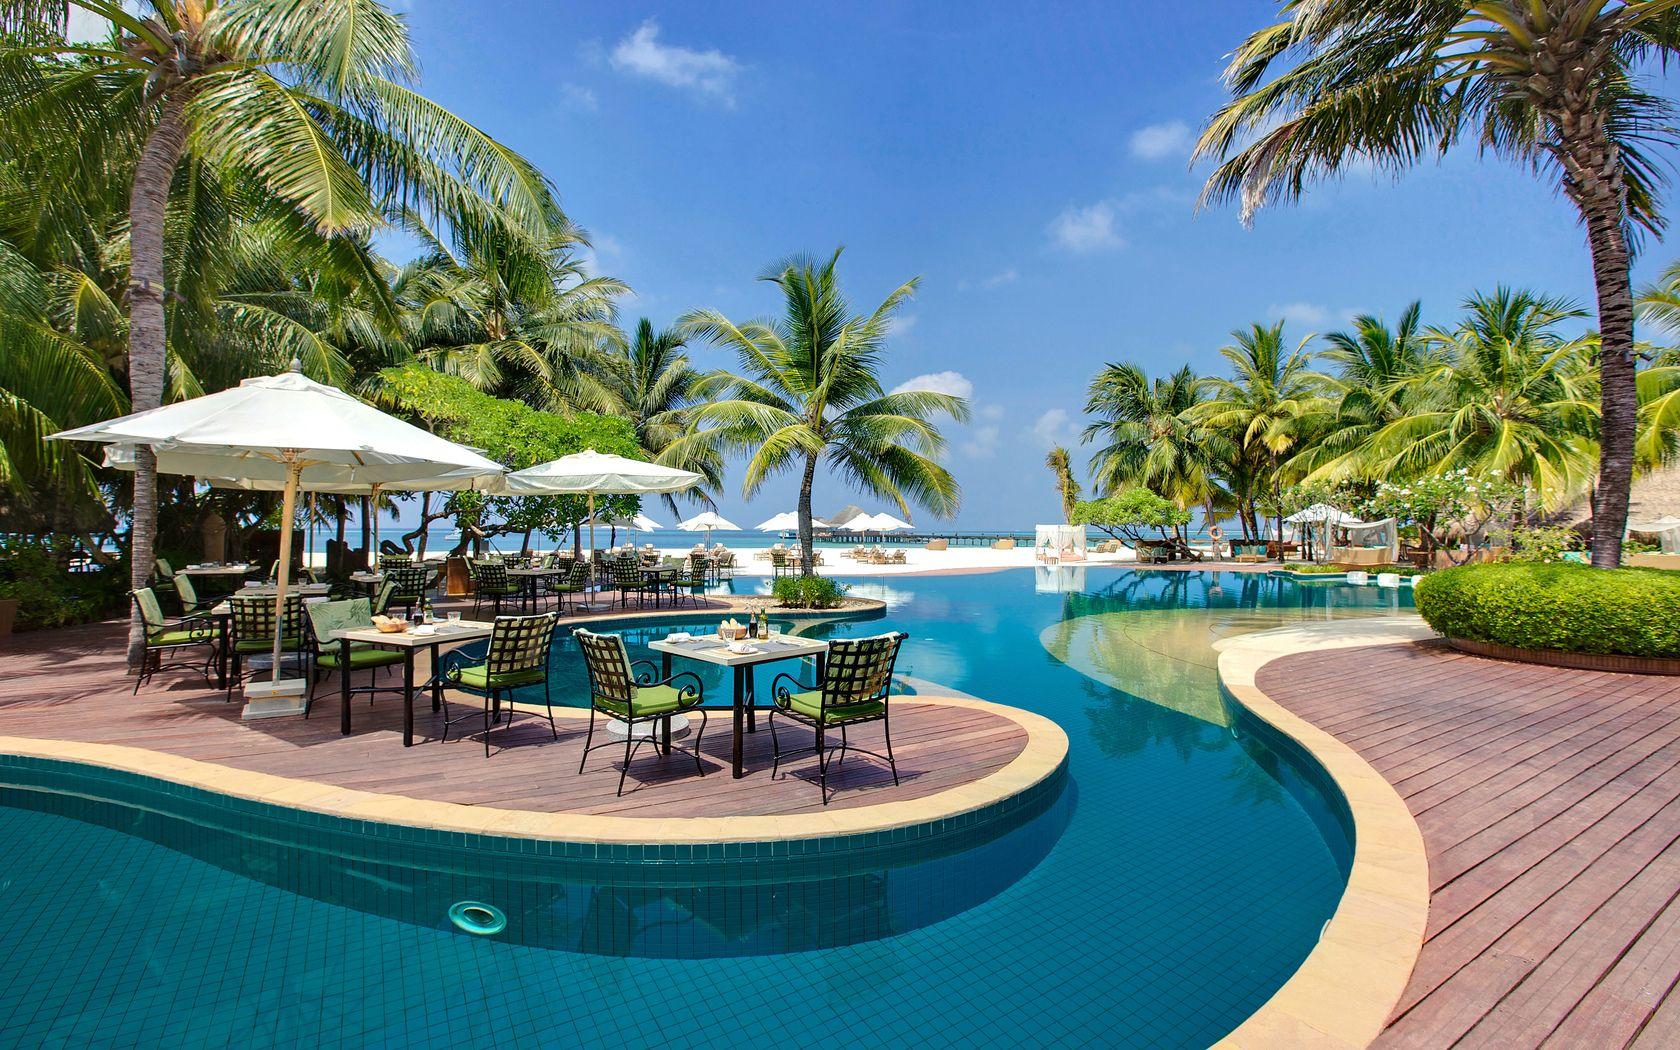 maldivy volshebnye ostrova v indijskom okeane 1 Мальдивы   Волшебные острова в Индийском океане